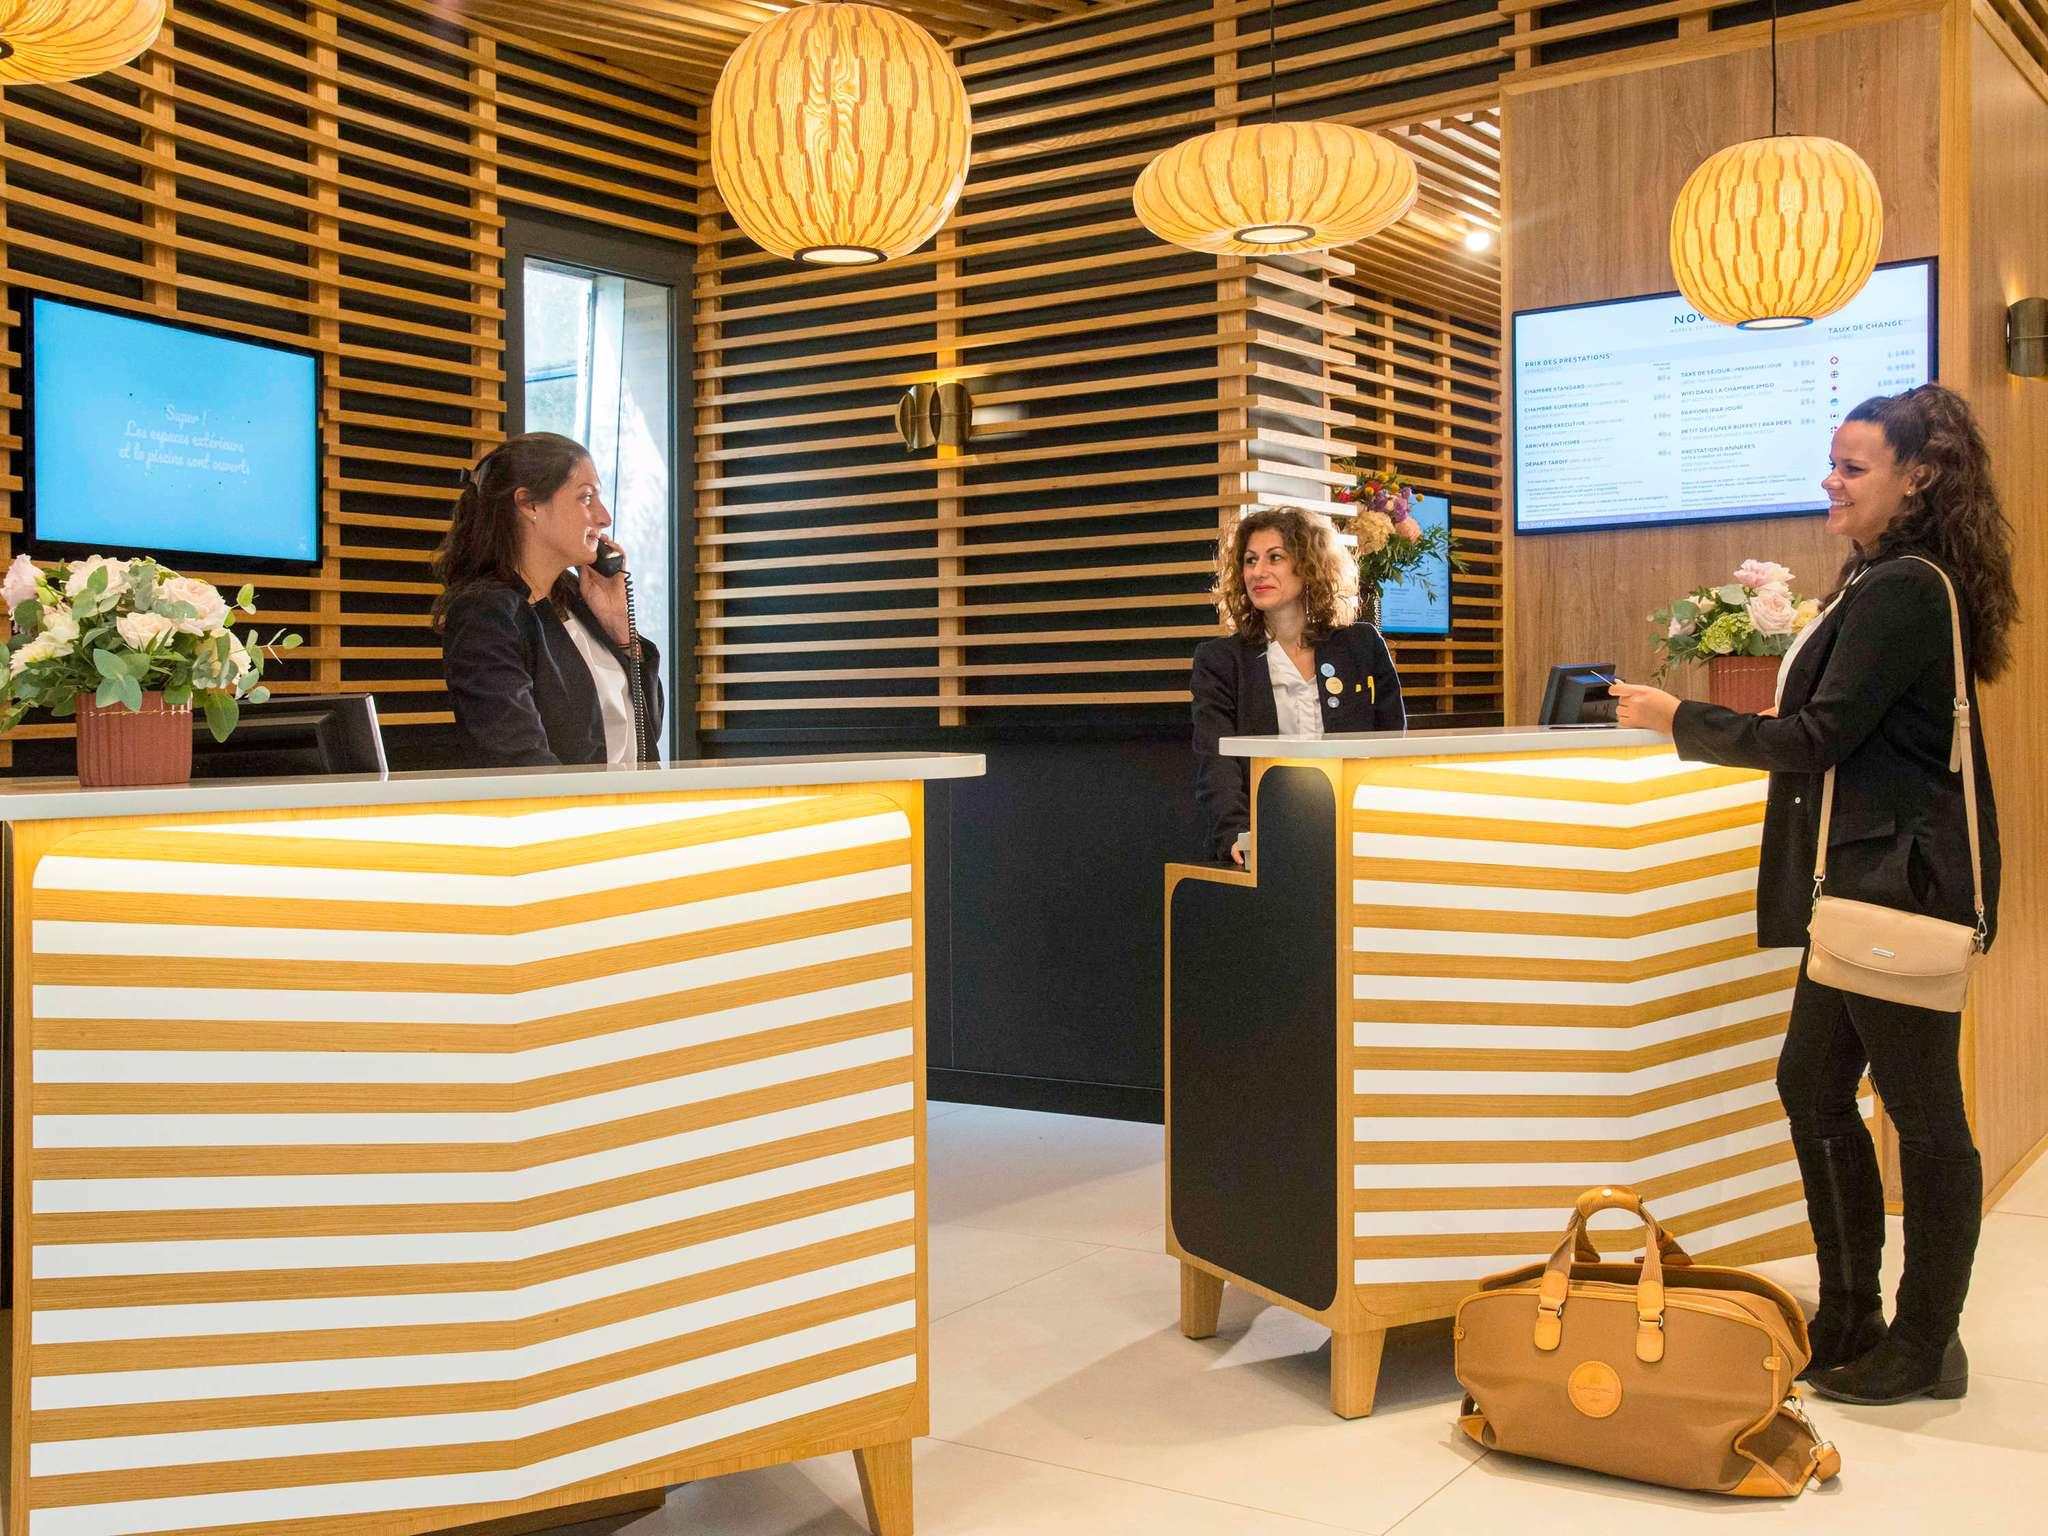 Hotell – Novotel Nice Arénas Aéroport